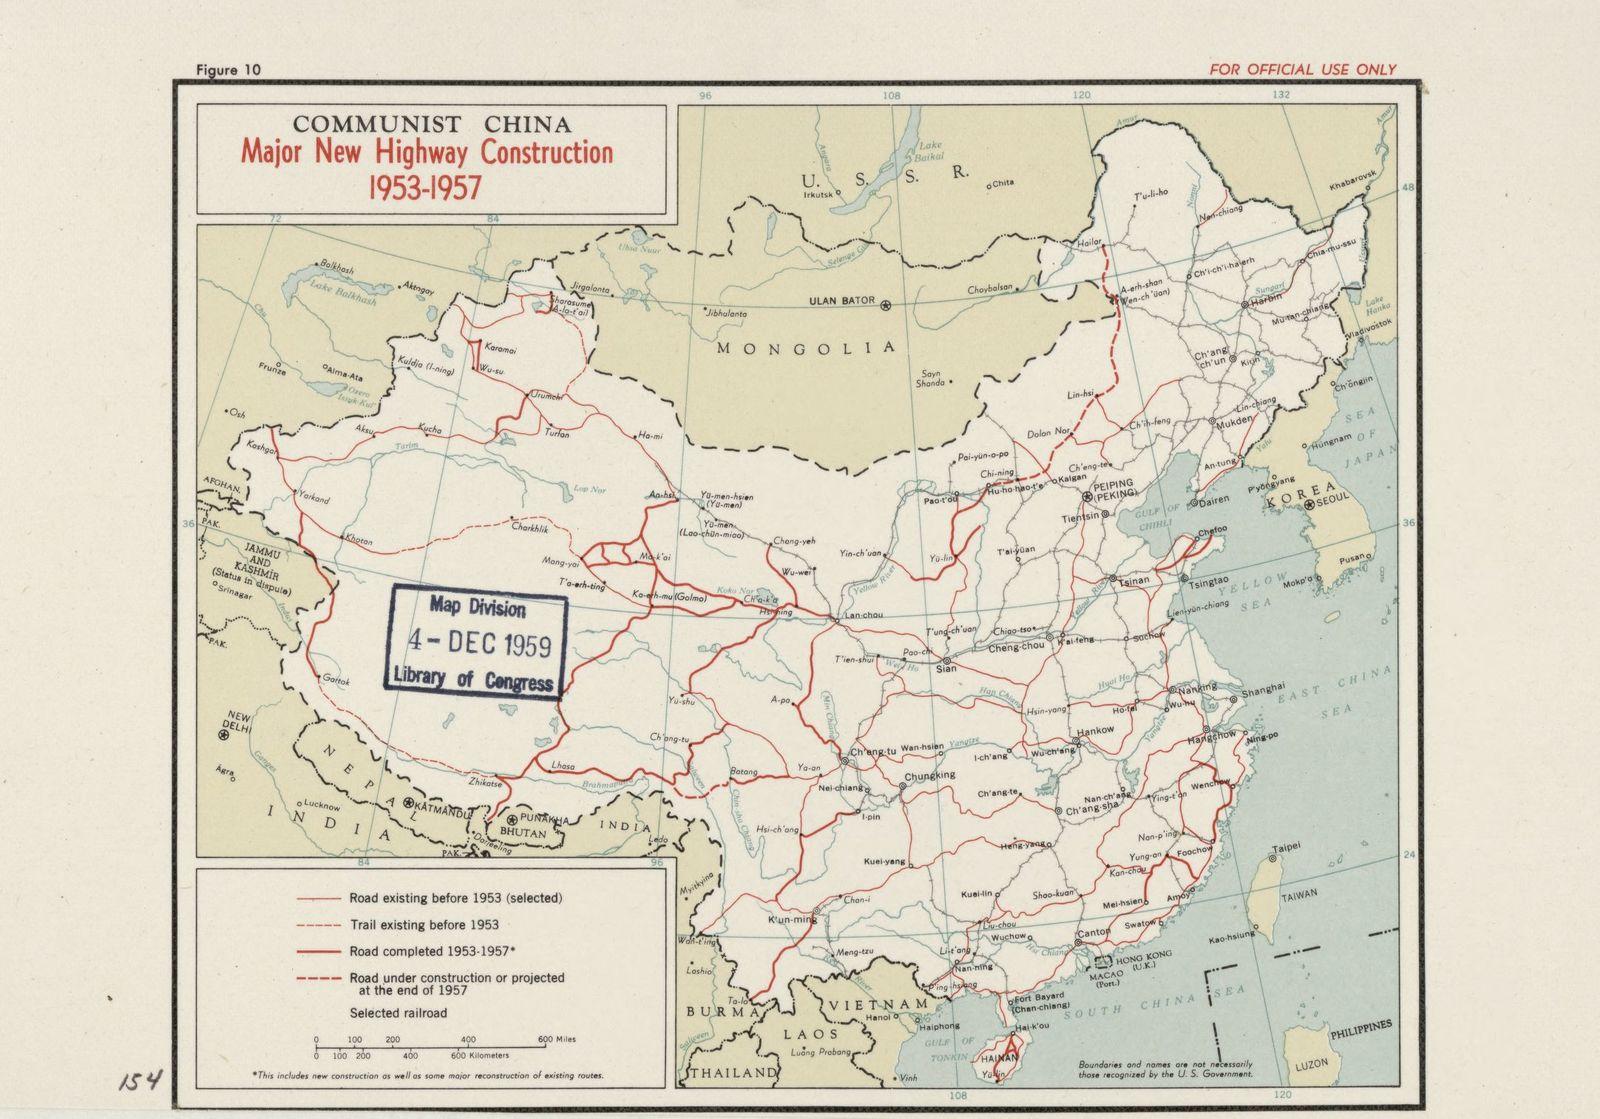 Communist China, major new highway construction 1953-1957.